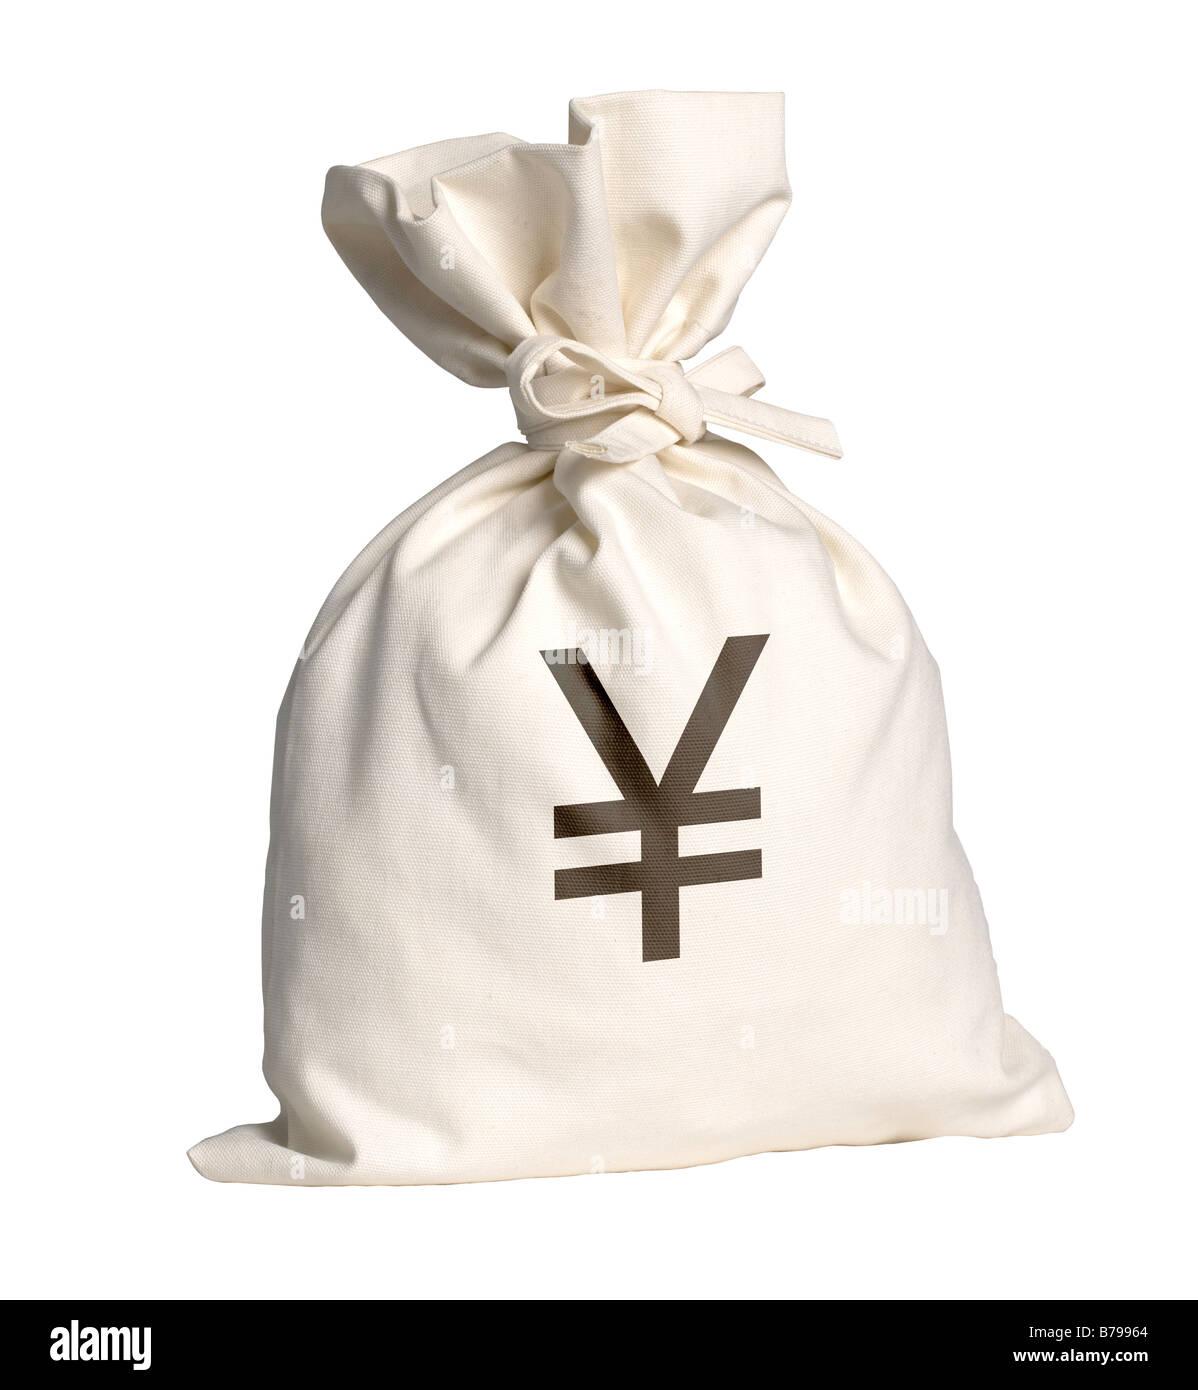 Money bag with Yen symbol - Stock Image